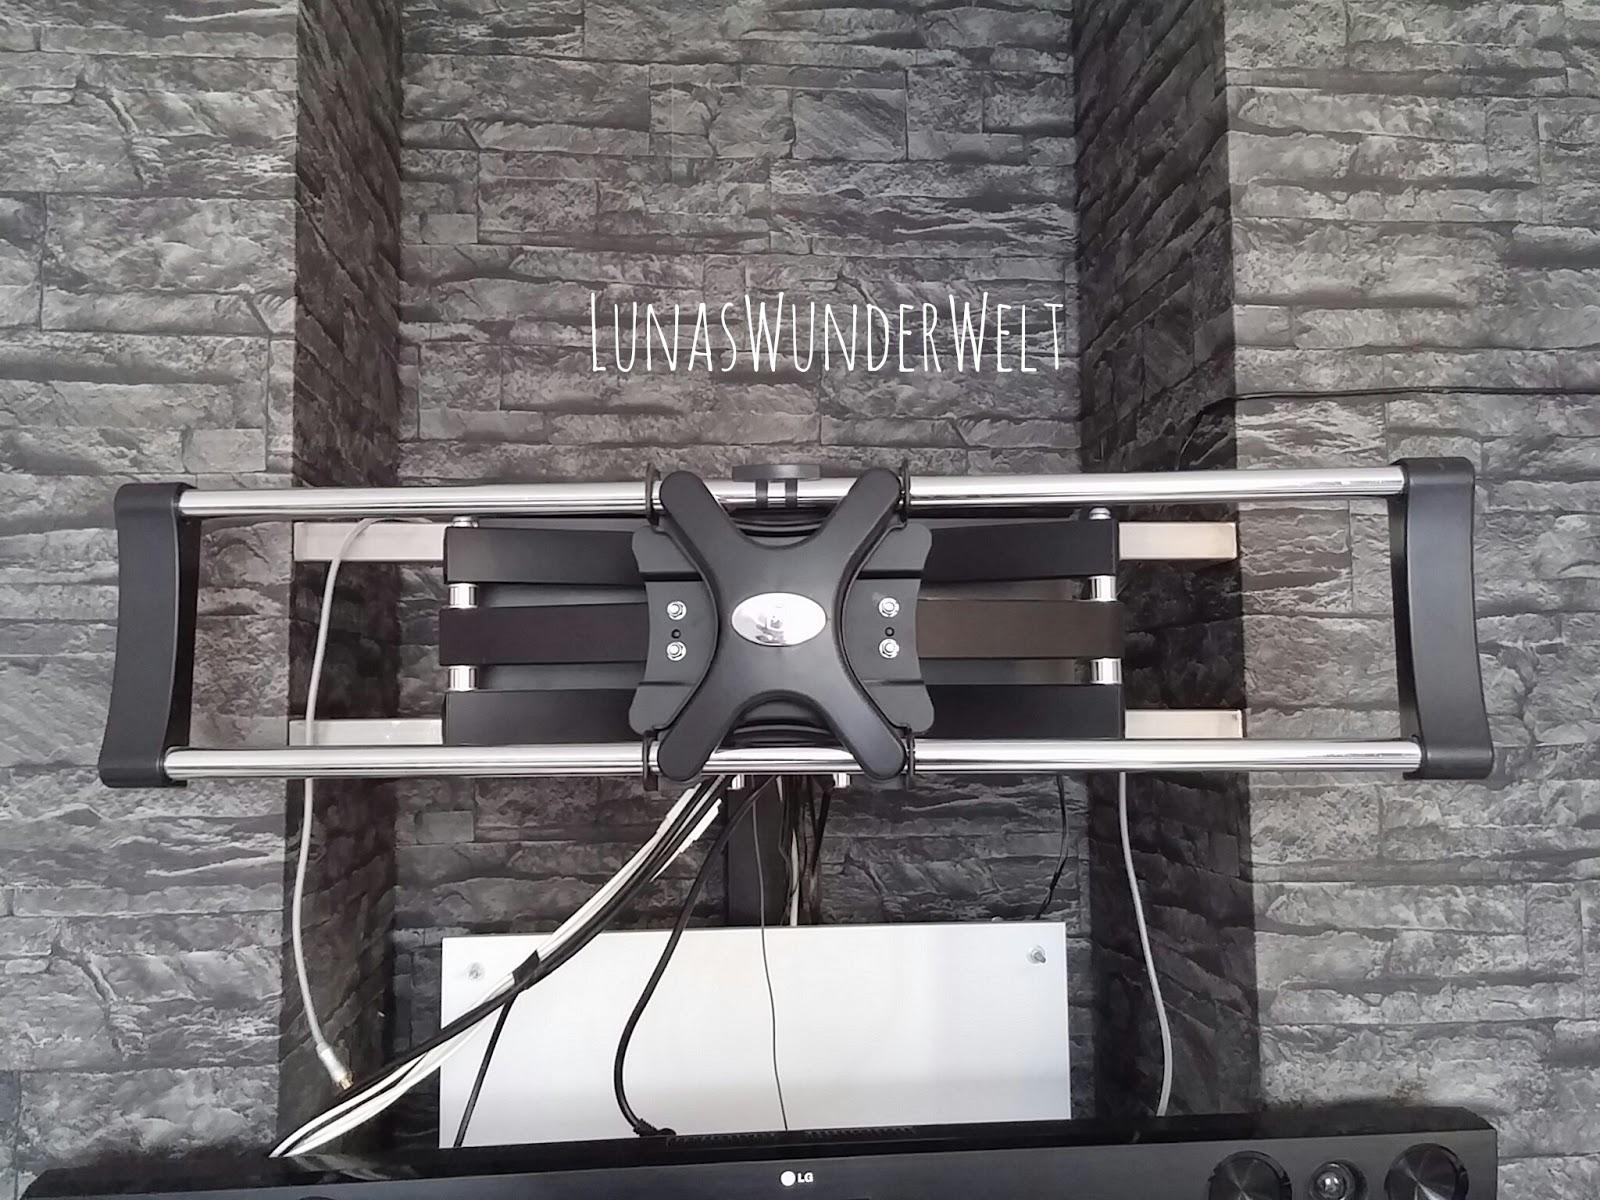 48pfs8159 philips 8100 series full hd fernseher lunaswunderwelt. Black Bedroom Furniture Sets. Home Design Ideas